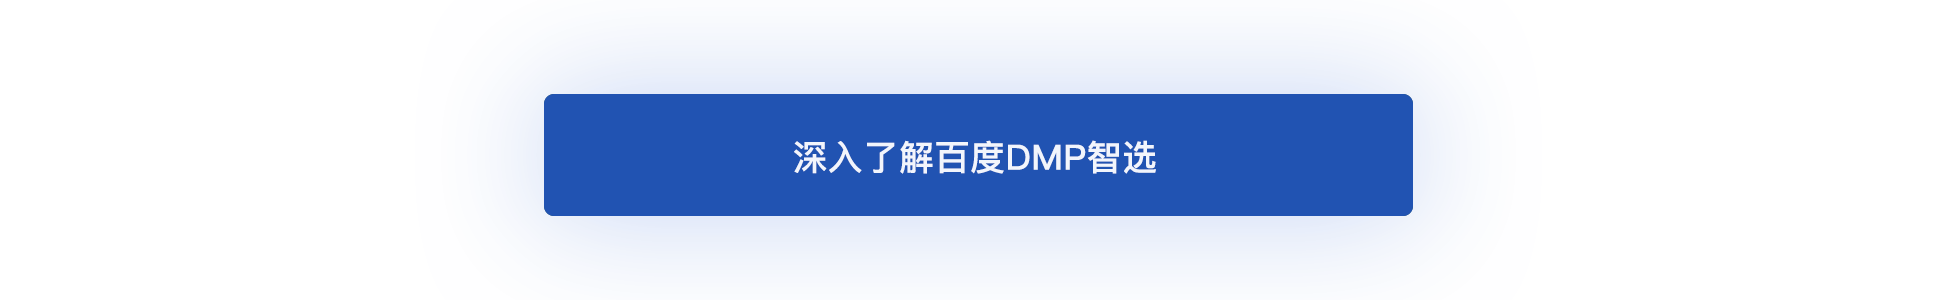 按钮DMP.png